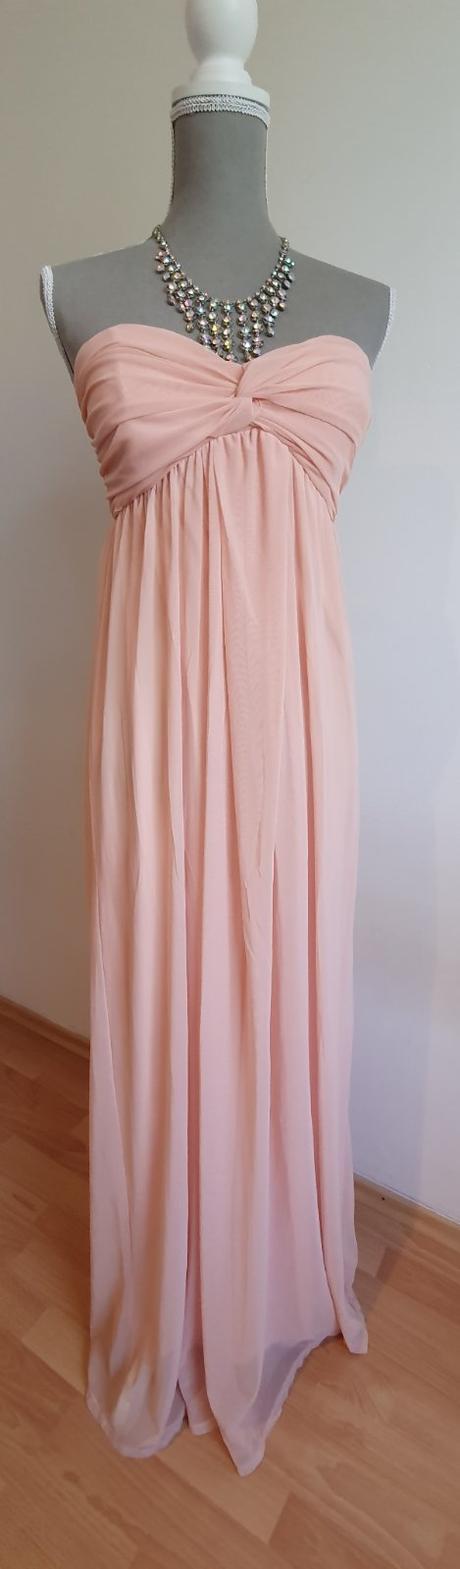 lahulinké šaty Tally Weijl - Obrázok č. 1